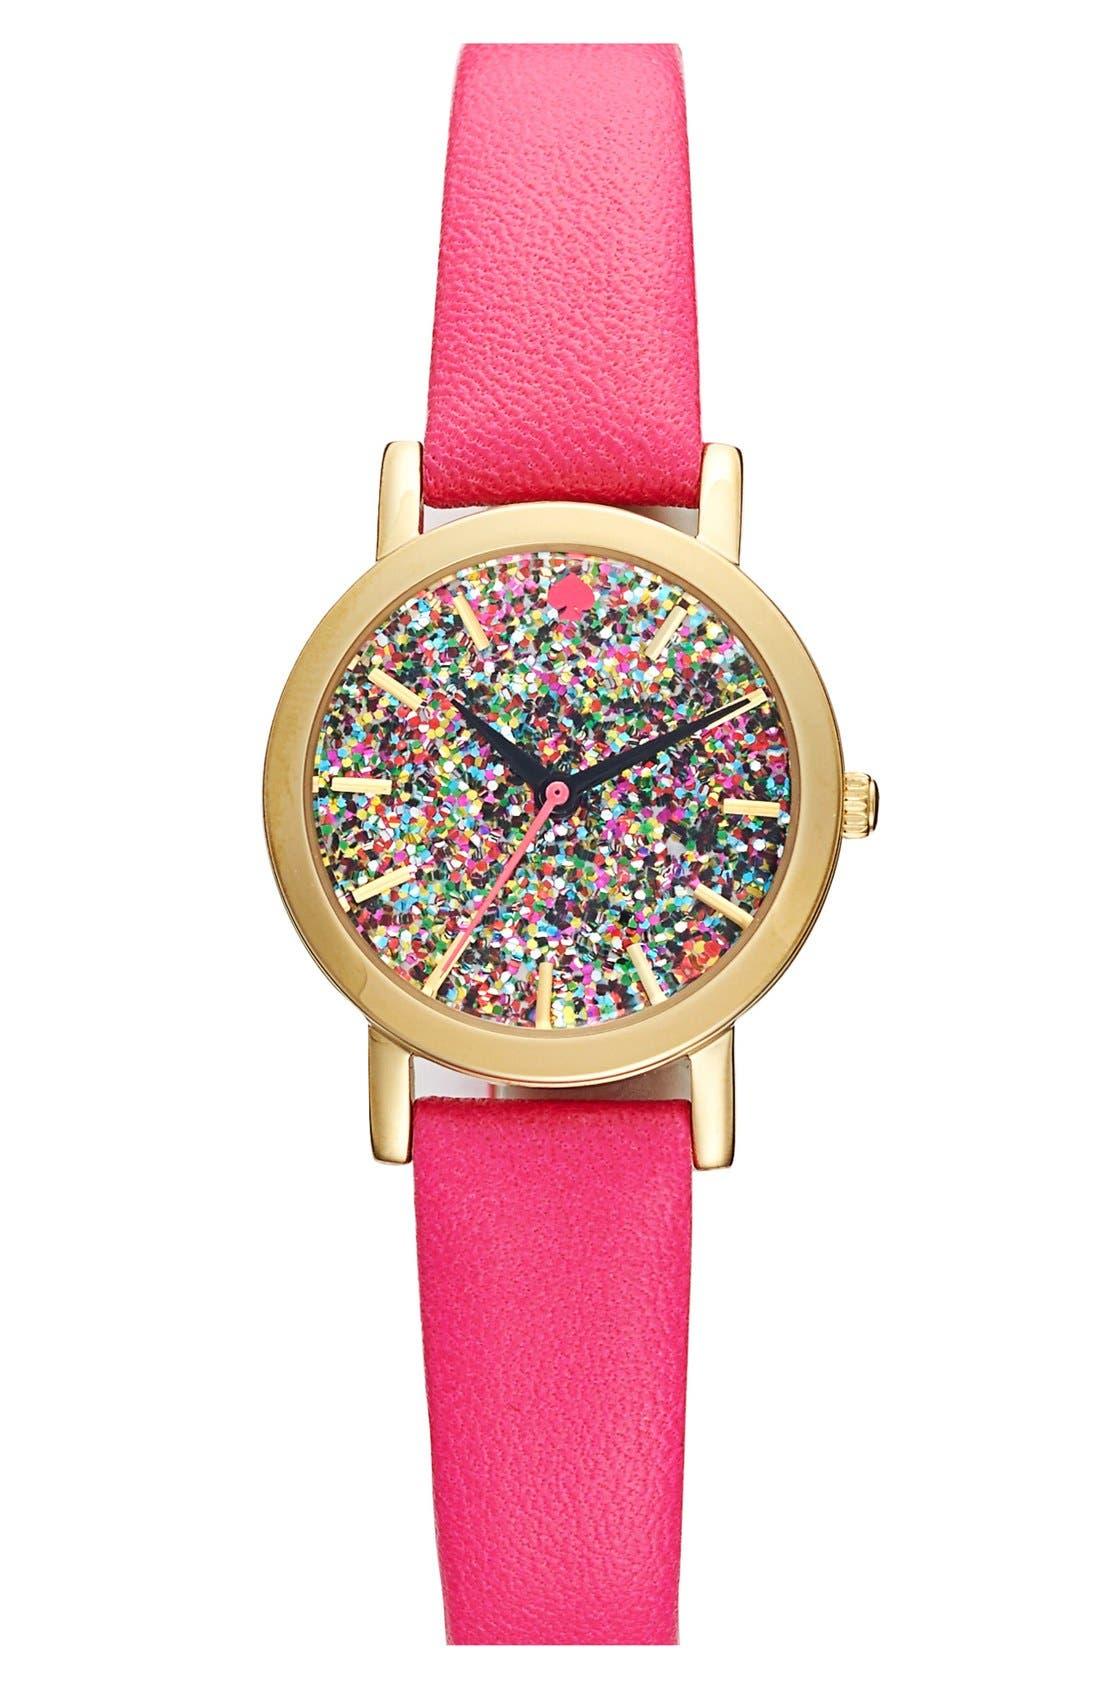 Main Image - kate spade new york 'metro mini' glitter dial watch, 24mm